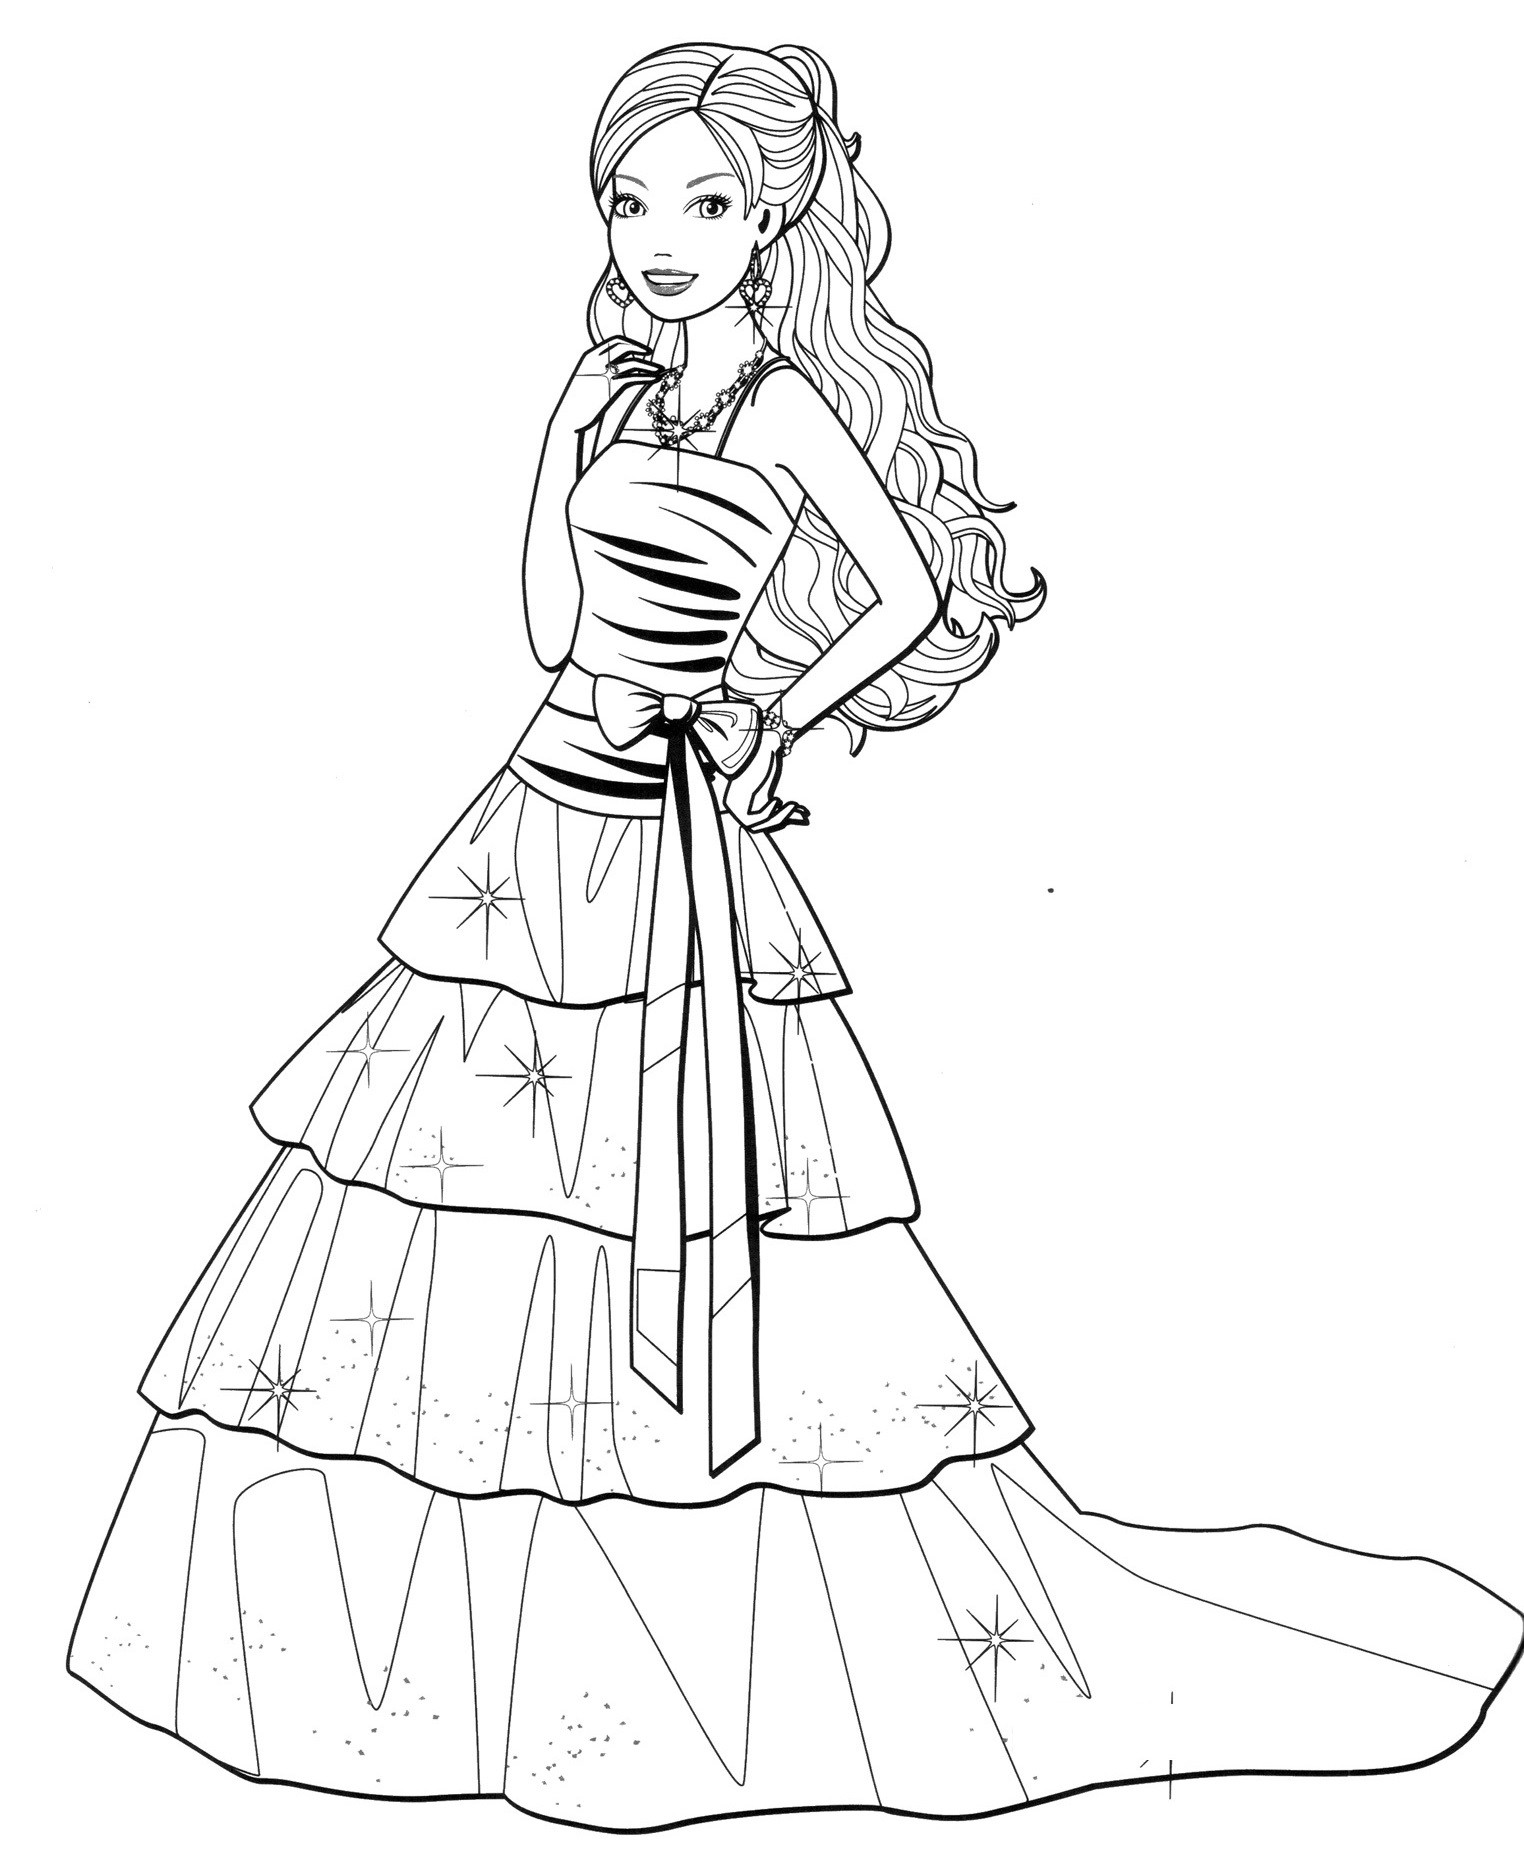 1524x1867 Barbie Dress Coloring Page For Girls Beautiful Fashion Dress